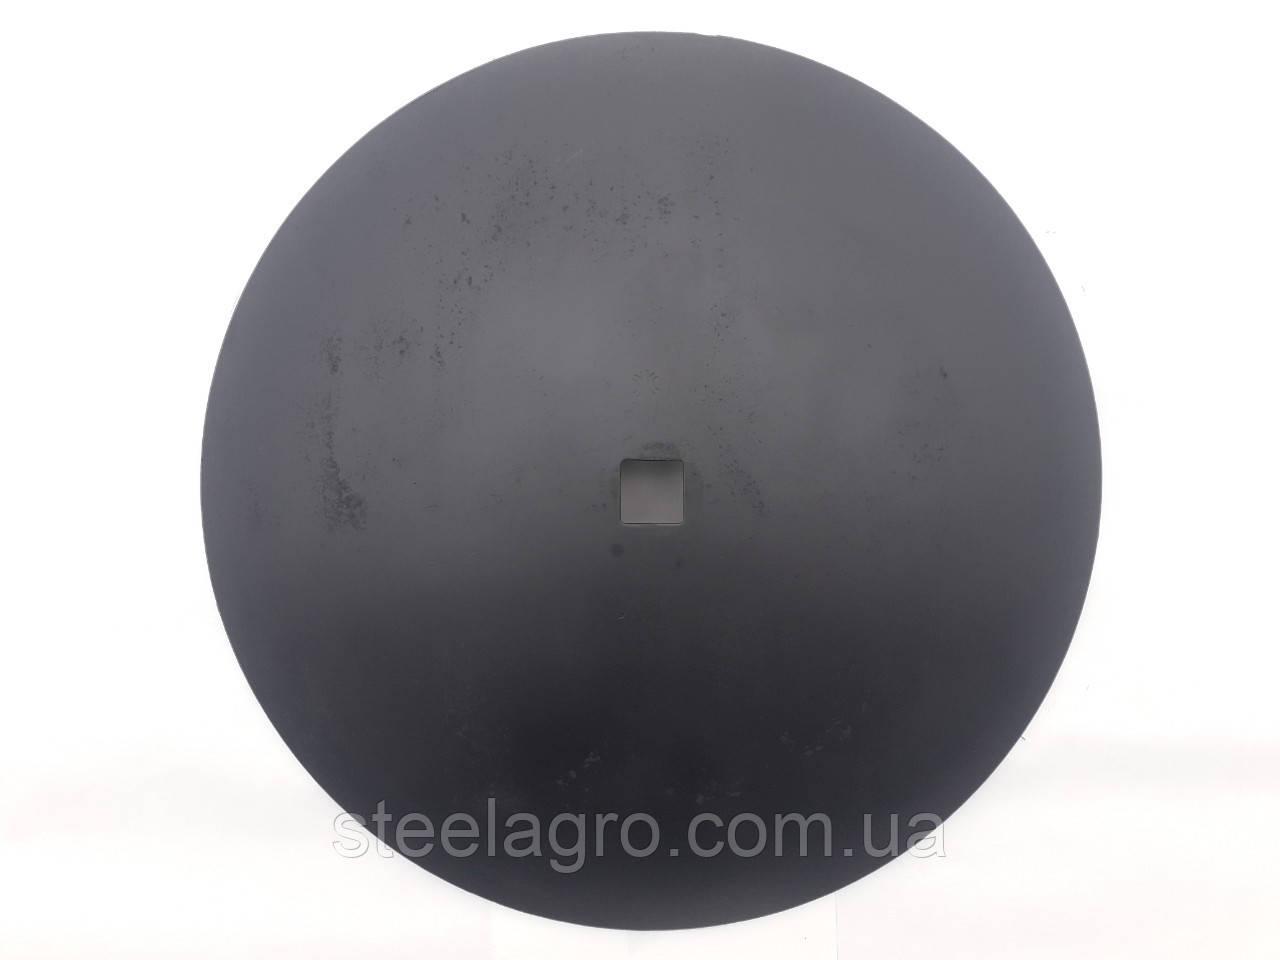 Диск борони D=660 мм, кв41, h=6мм гладкий ст30МпВ5 (Gregoire Besson/Kverneland) Грегорі бесон арт. 851001098